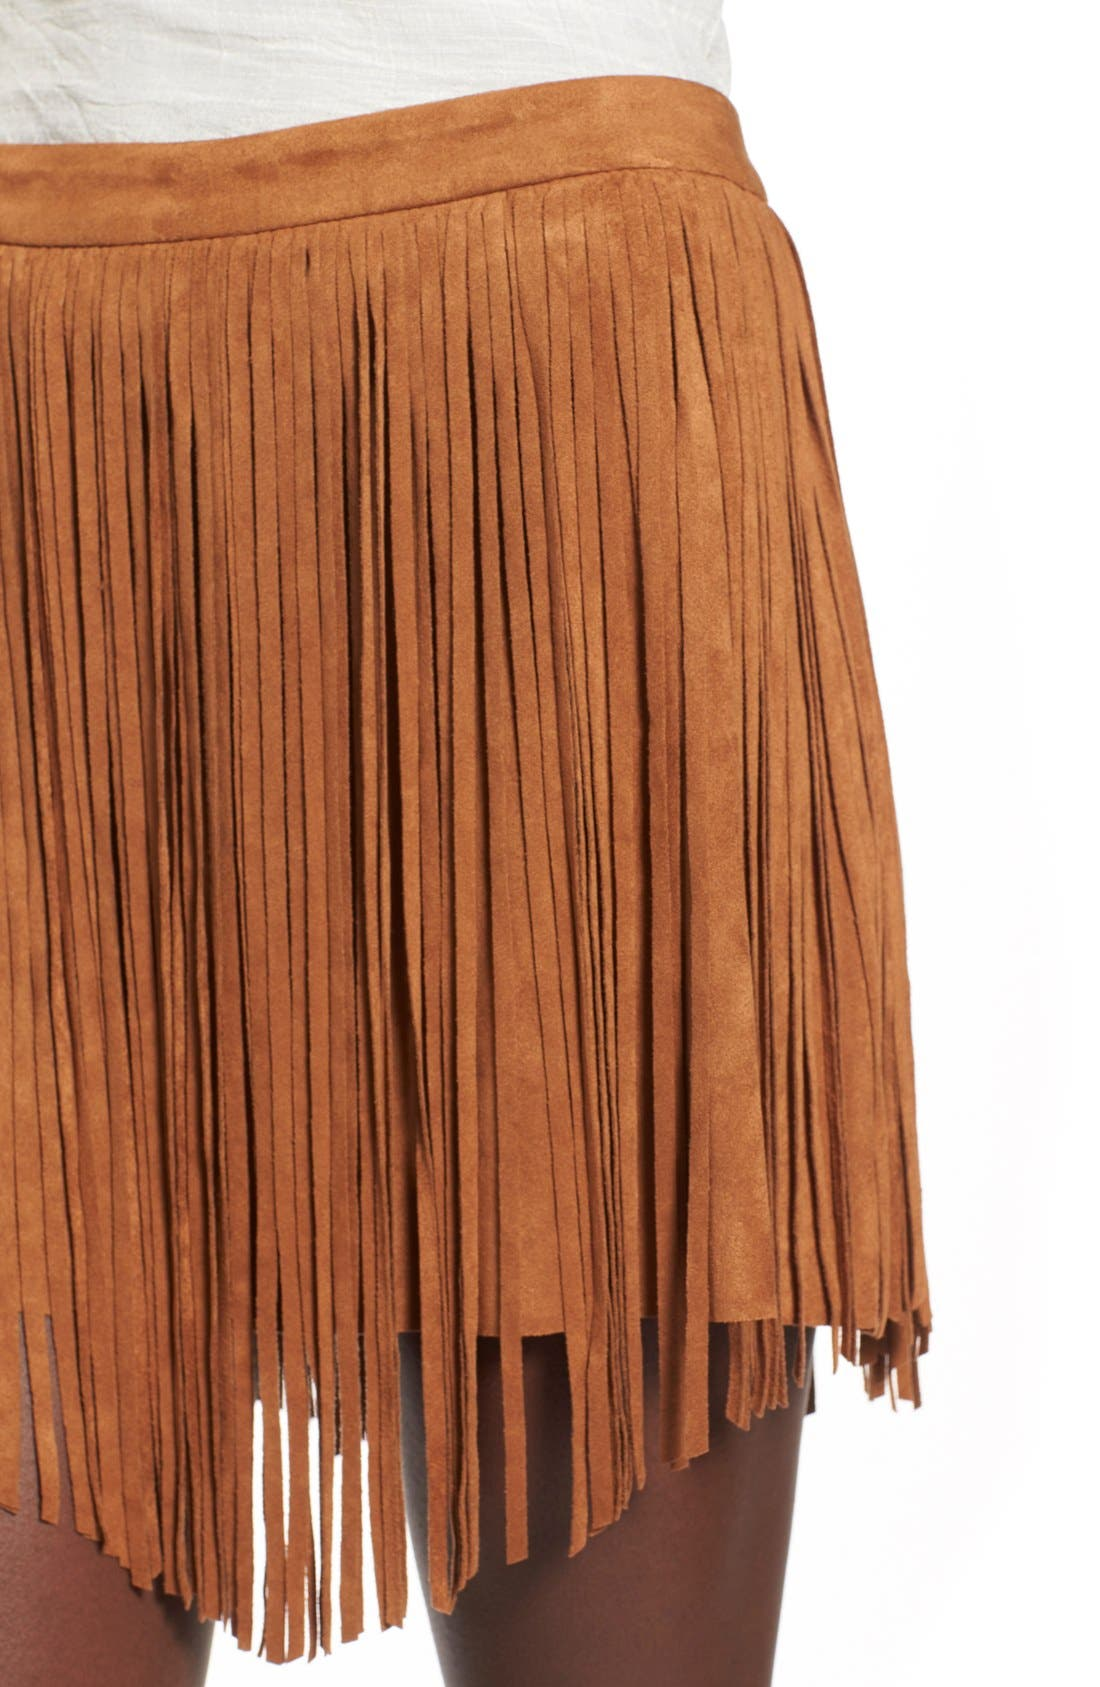 Fringe FauxSuede Skirt,                             Alternate thumbnail 4, color,                             216